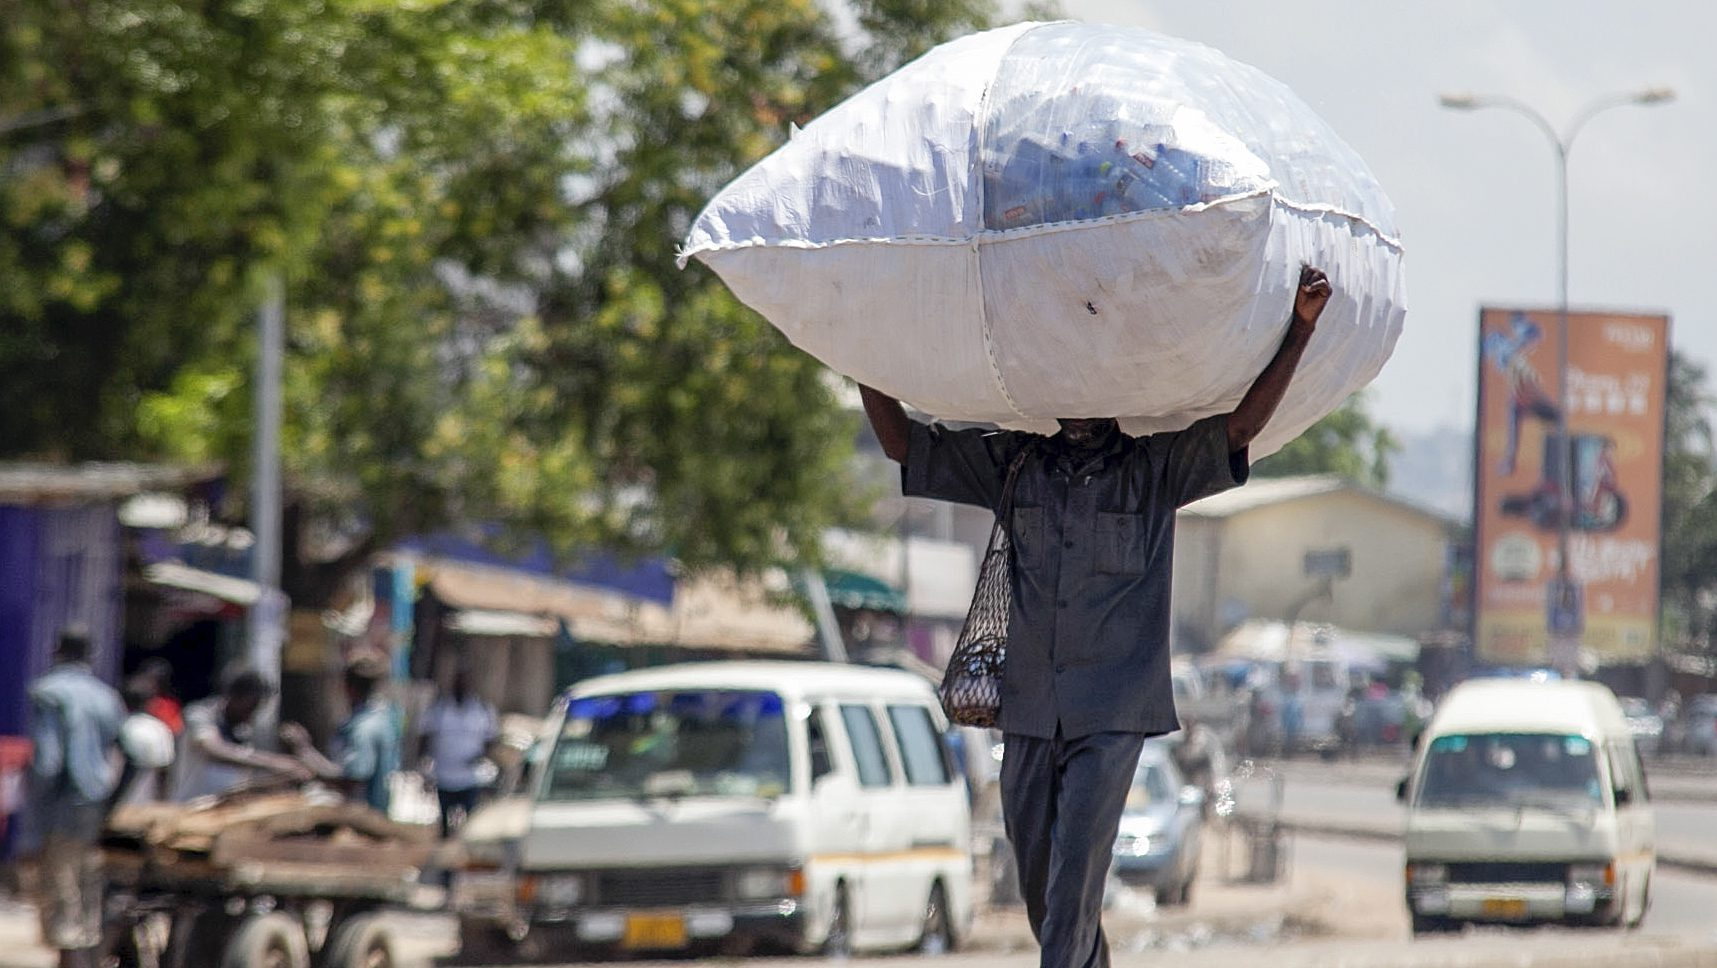 A Ghanaian man walks down a street carrying recyclable plastic bottles in Accra, Ghana.